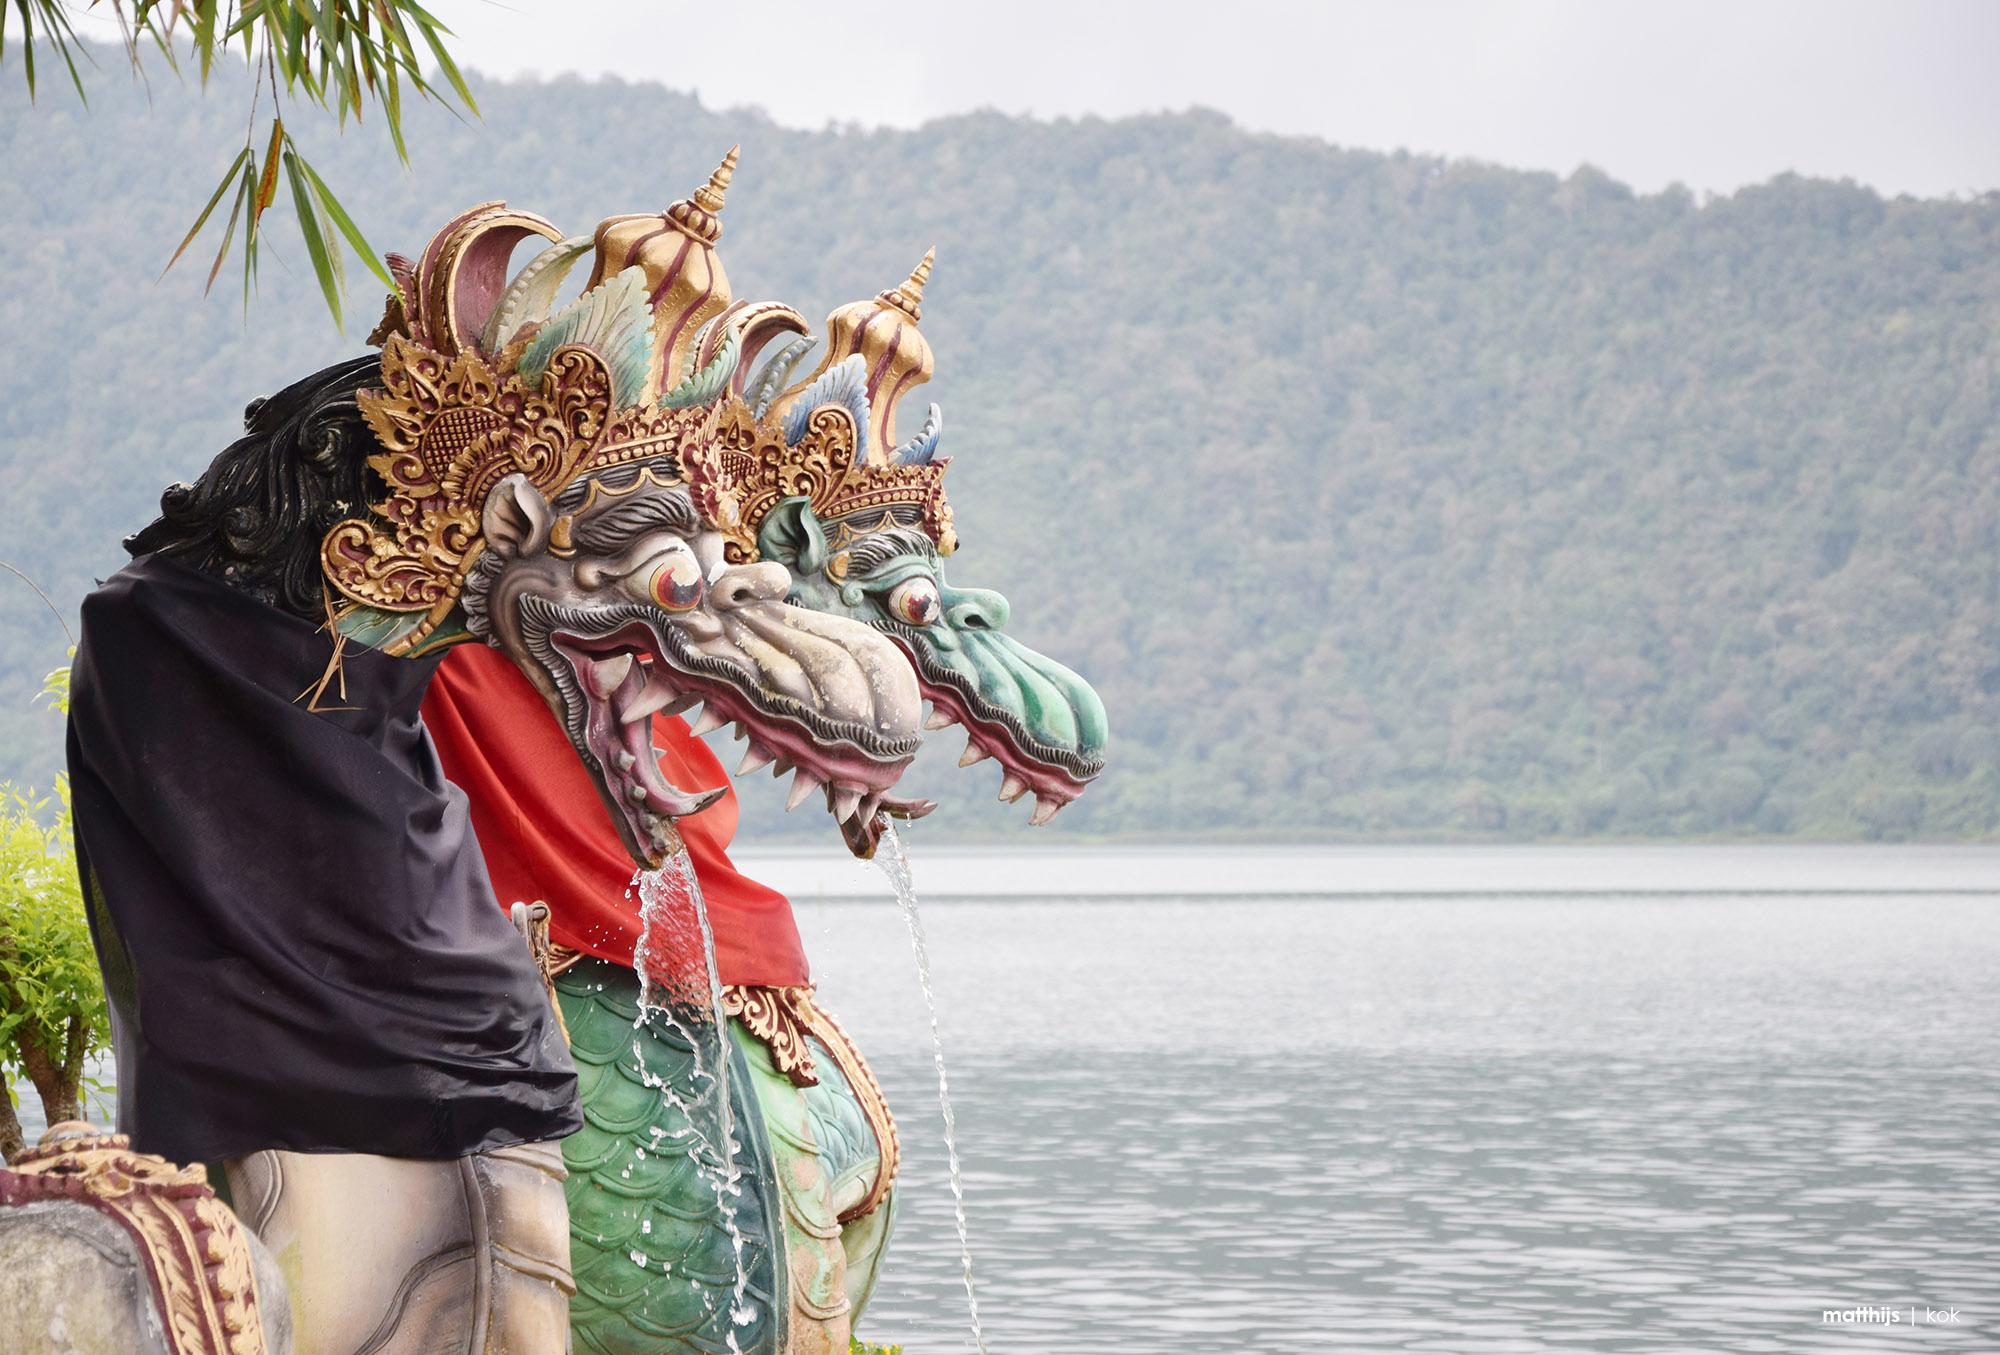 Ulun Danu Bratan, Bali | Photo by Matthijs Kok